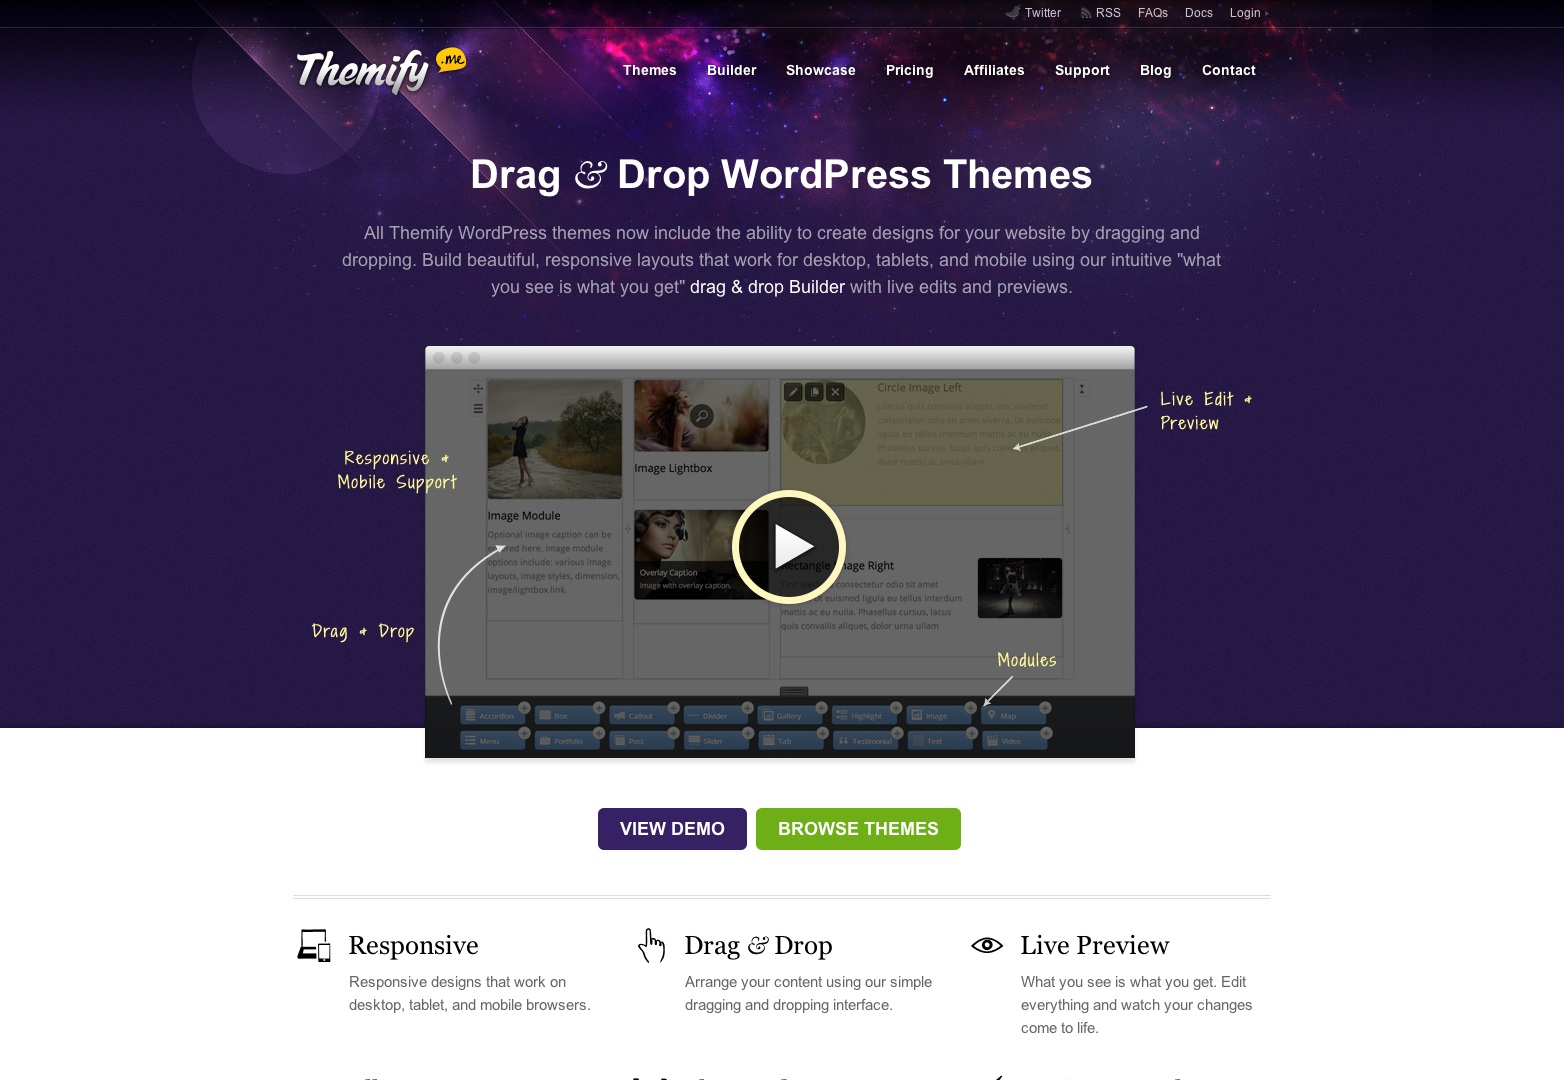 Themify : Drag & Drop WordPress Themes